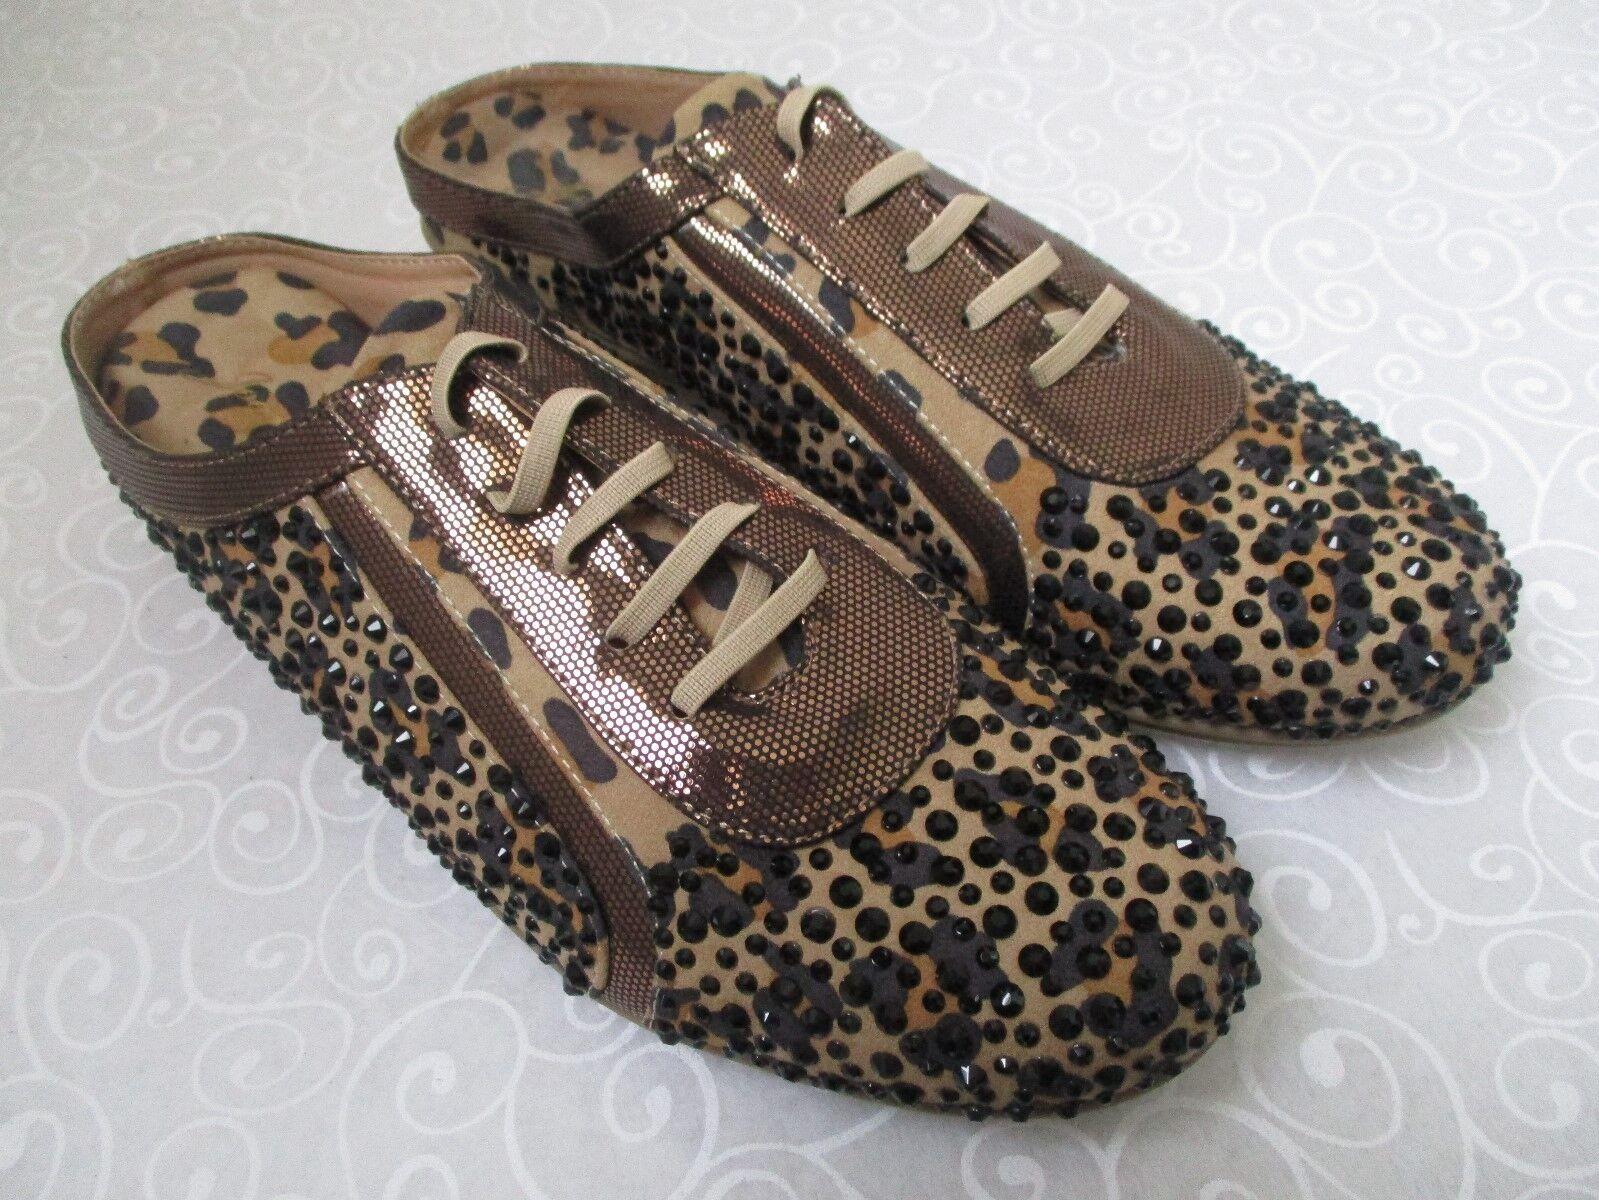 89 JOAN BLACK BOYCE BLACK JOAN & BROWN RHINESTONE SLIDES Schuhe SIZE 9 W - NEW 2b9183